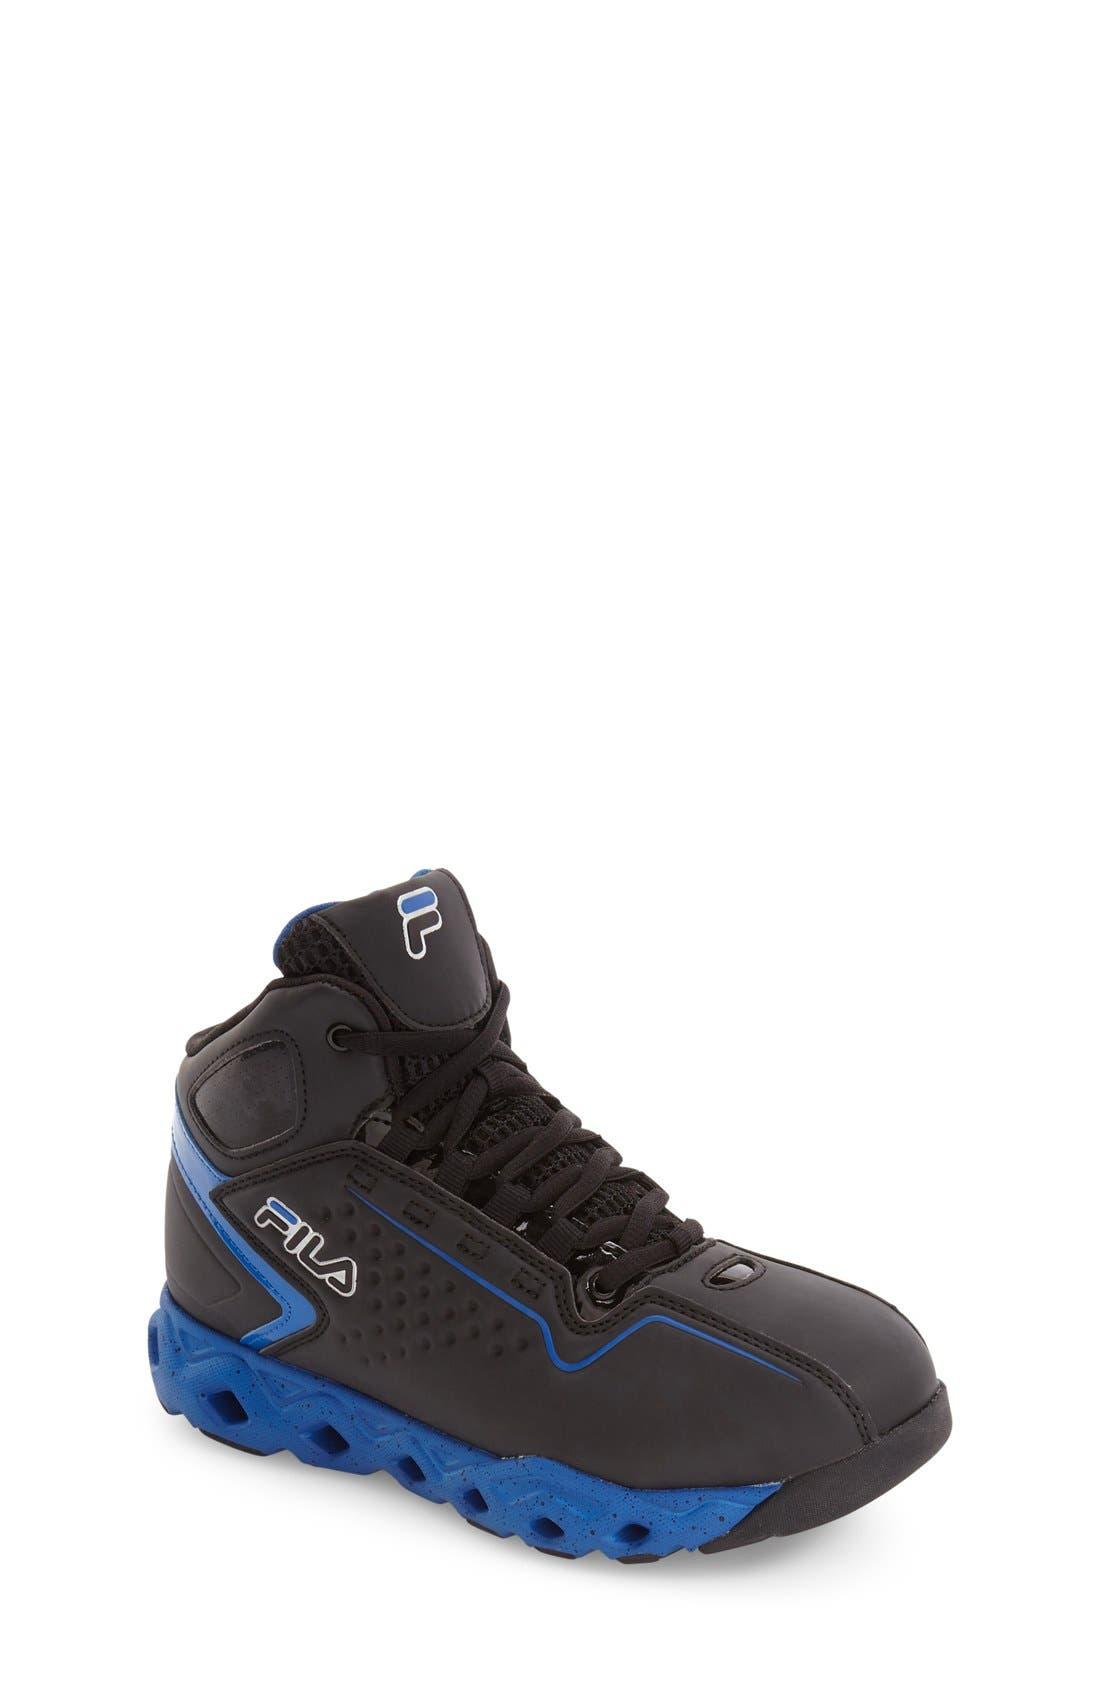 FILA Big Bang High Top Sneaker, Main, color, 001